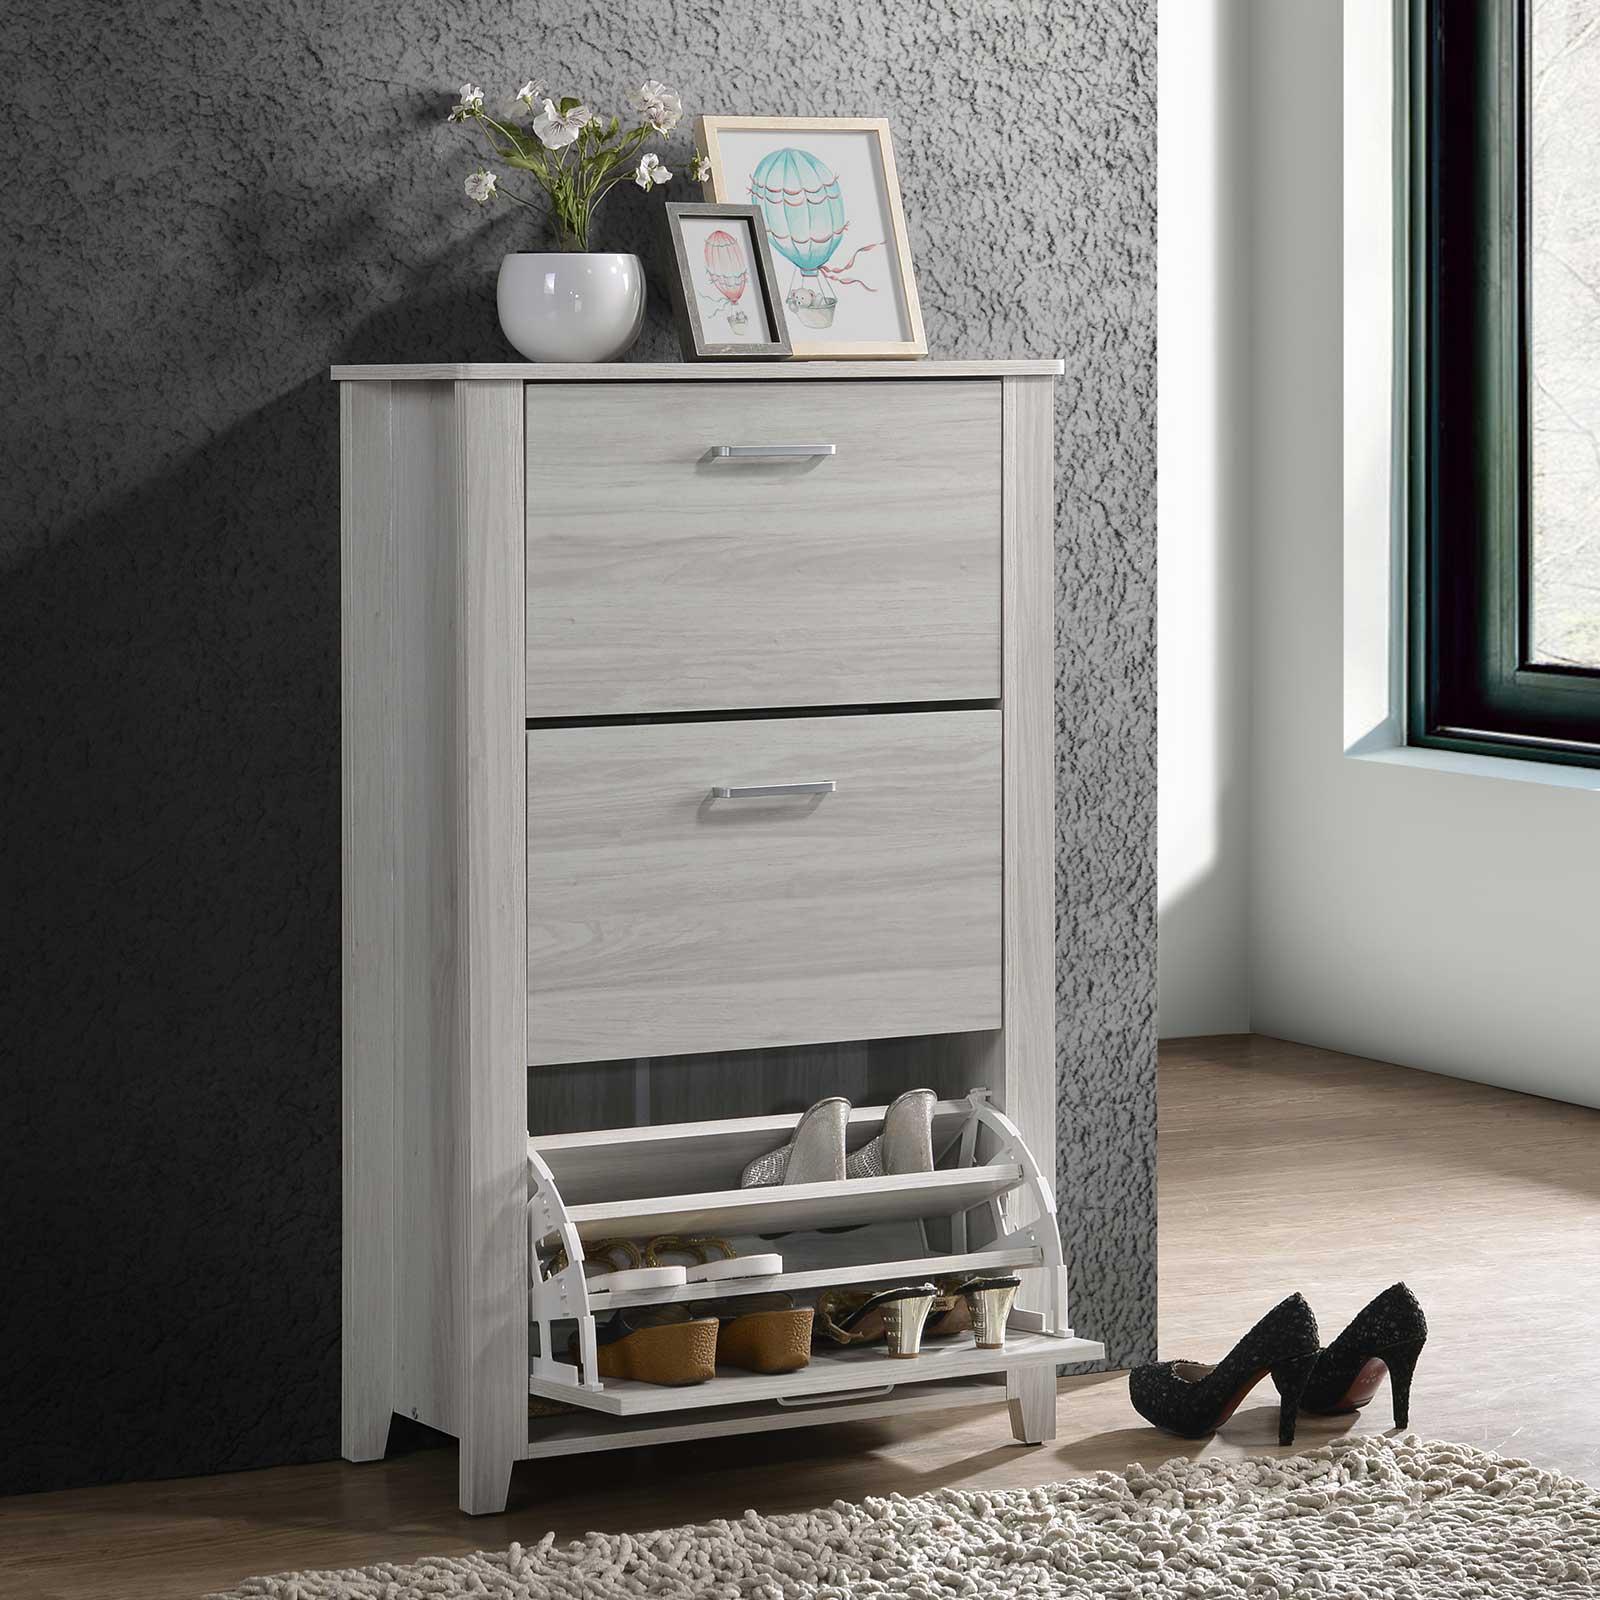 Shoe Cabinet w/ 3 Compartment in White Oak Rack Storage Entryway Organizer ⭐ E-LIVING Furniture